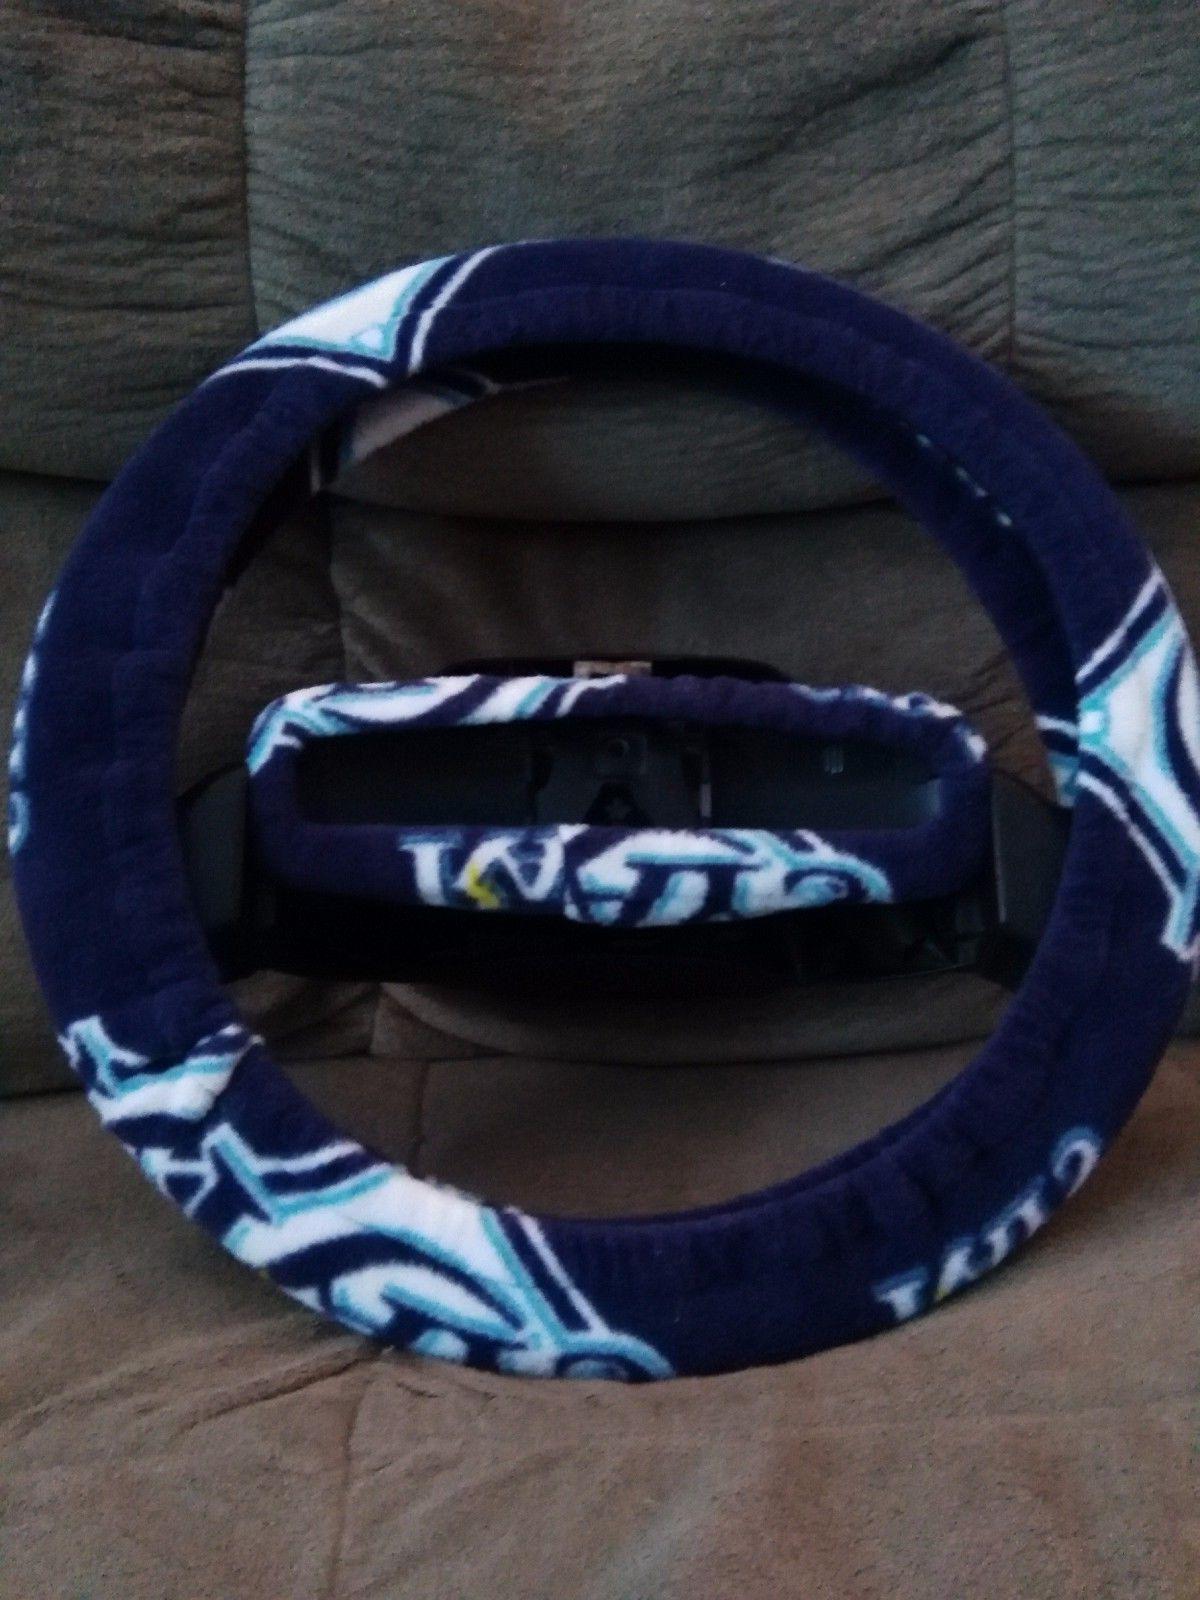 tampa bay rays fleece steering wheel cover